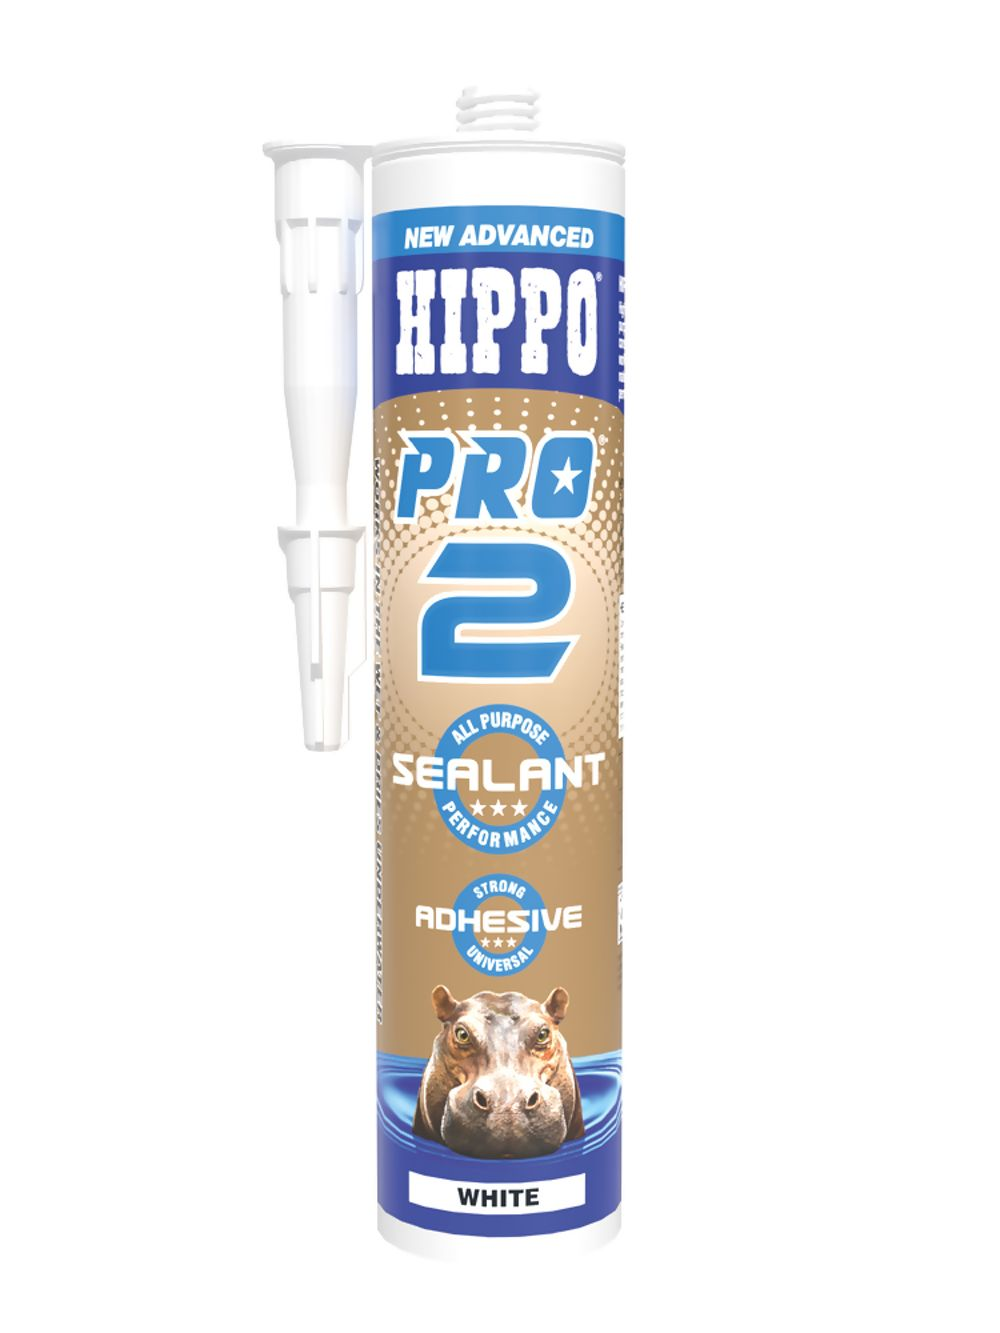 Hippo Pro 2 Sealant & Adhesive White 310ml Ref H18502